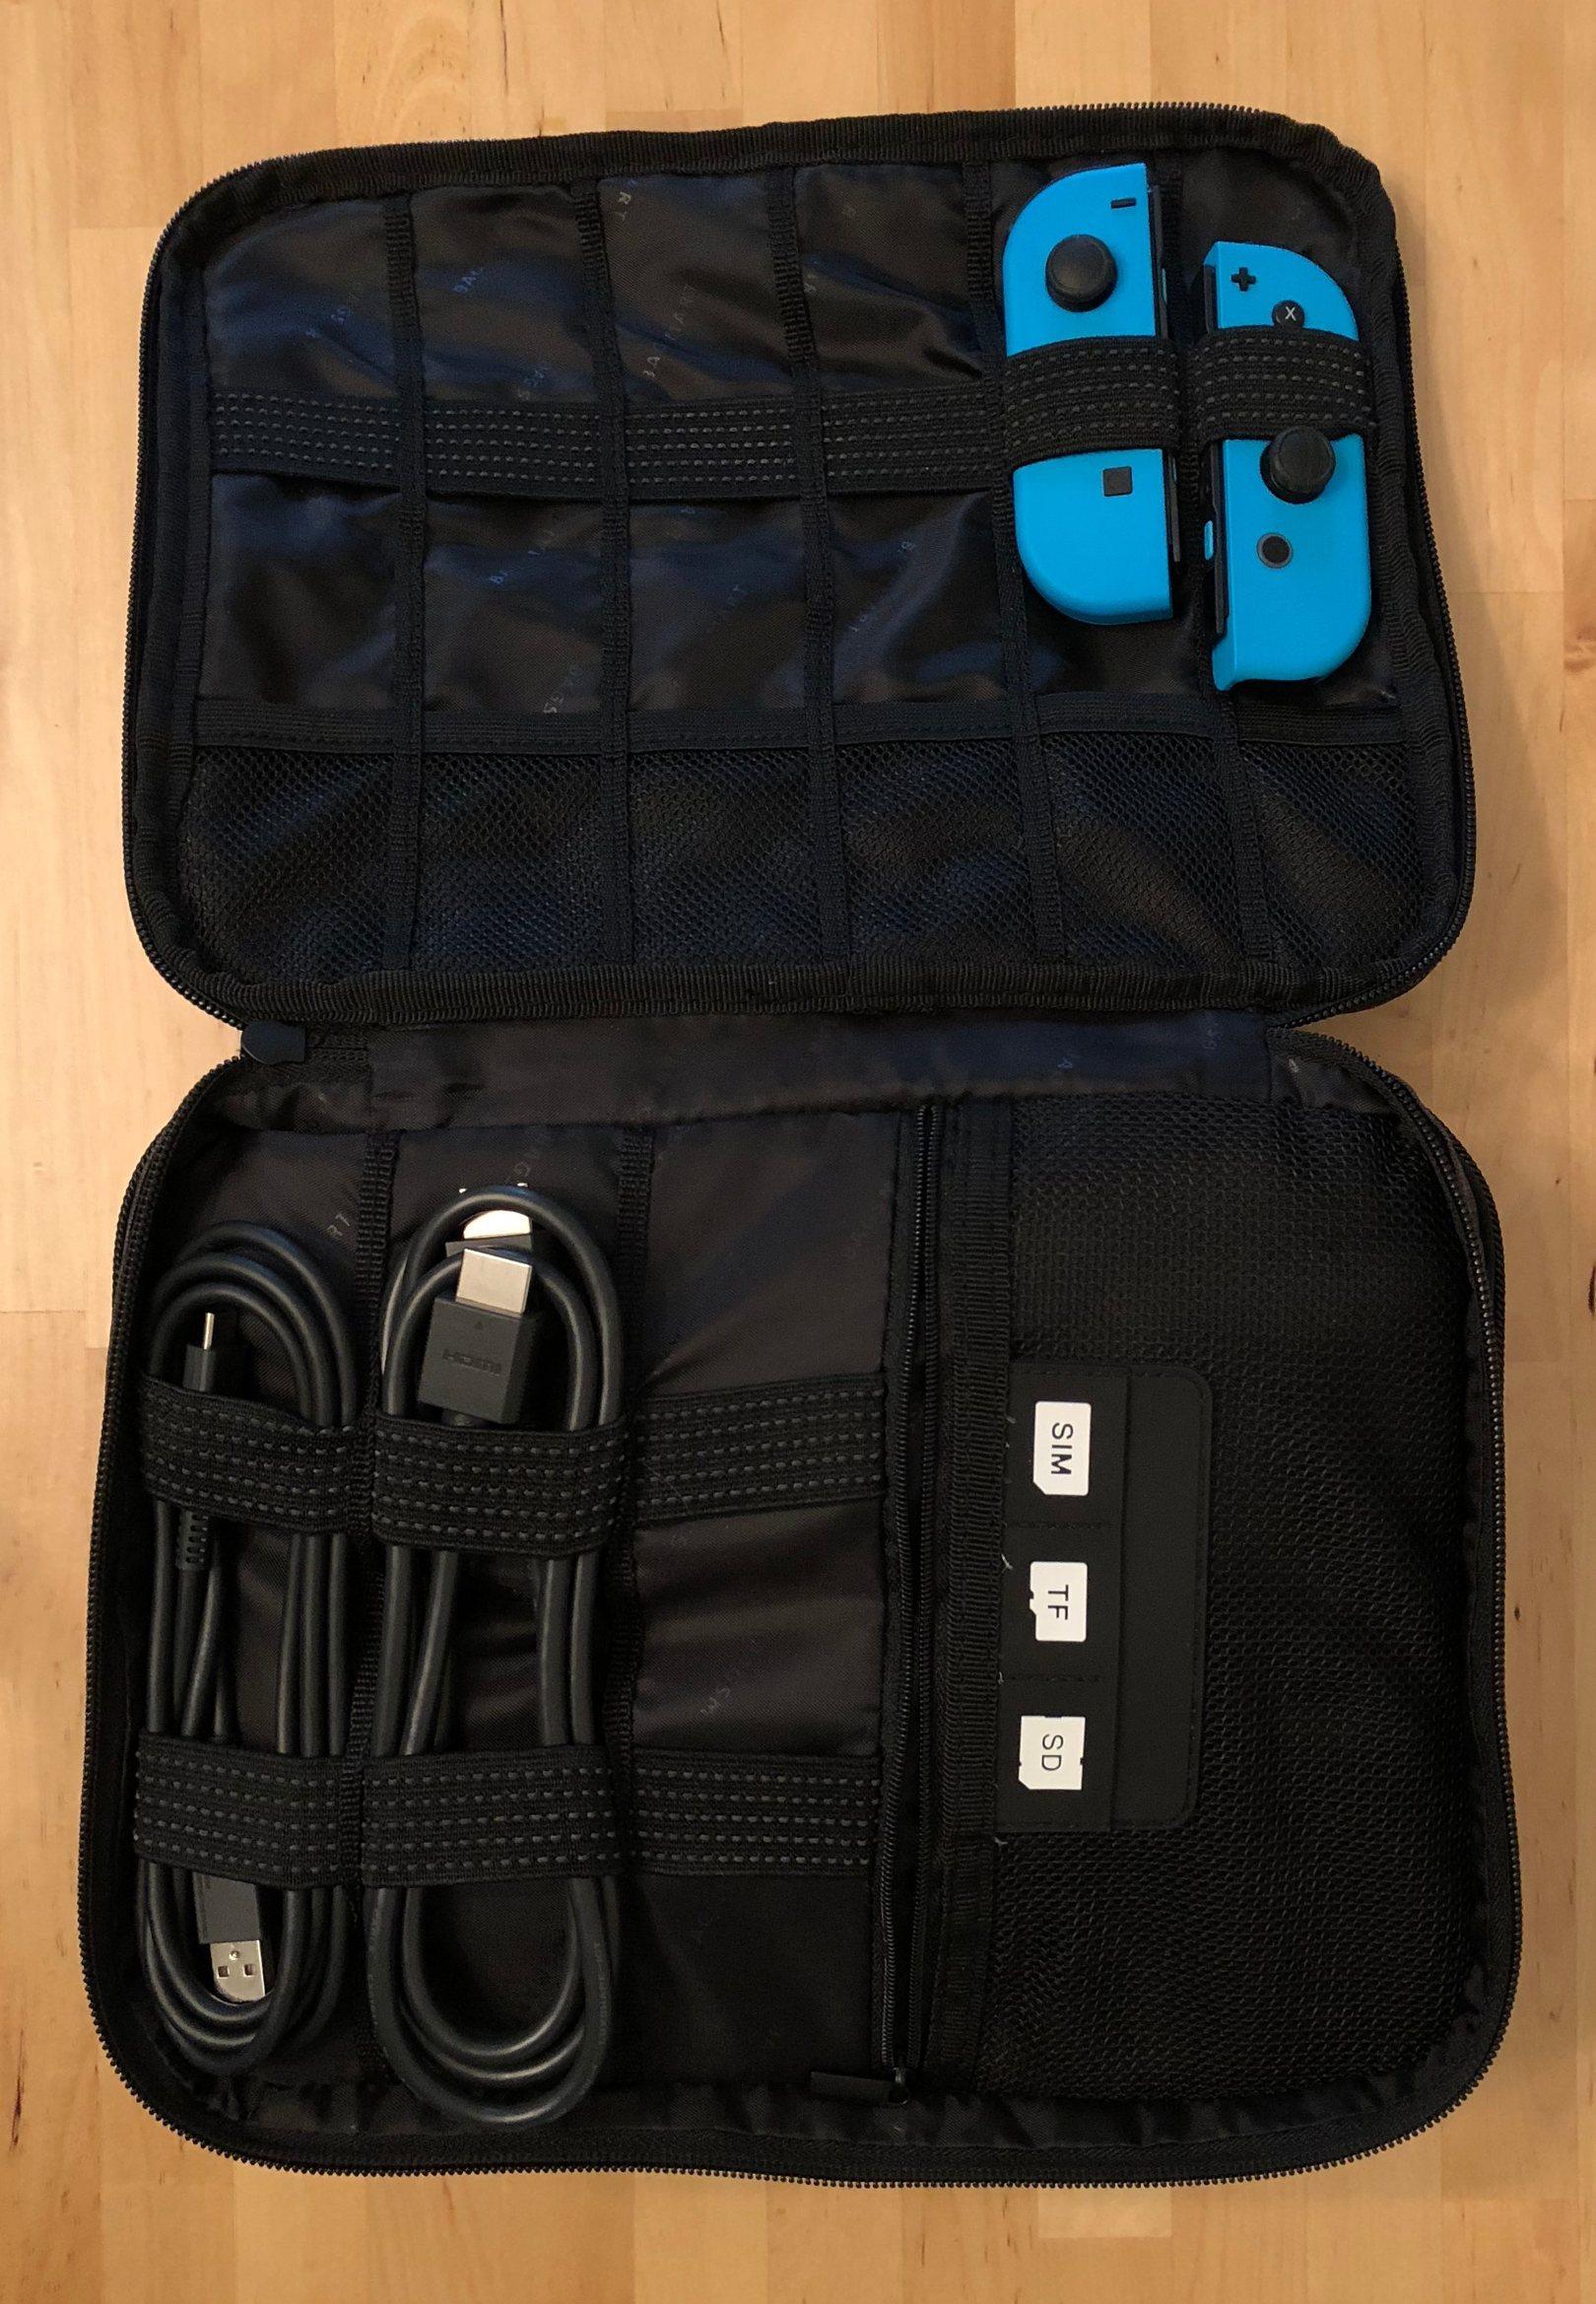 Organizador de viajes BAGSMART de doble capa